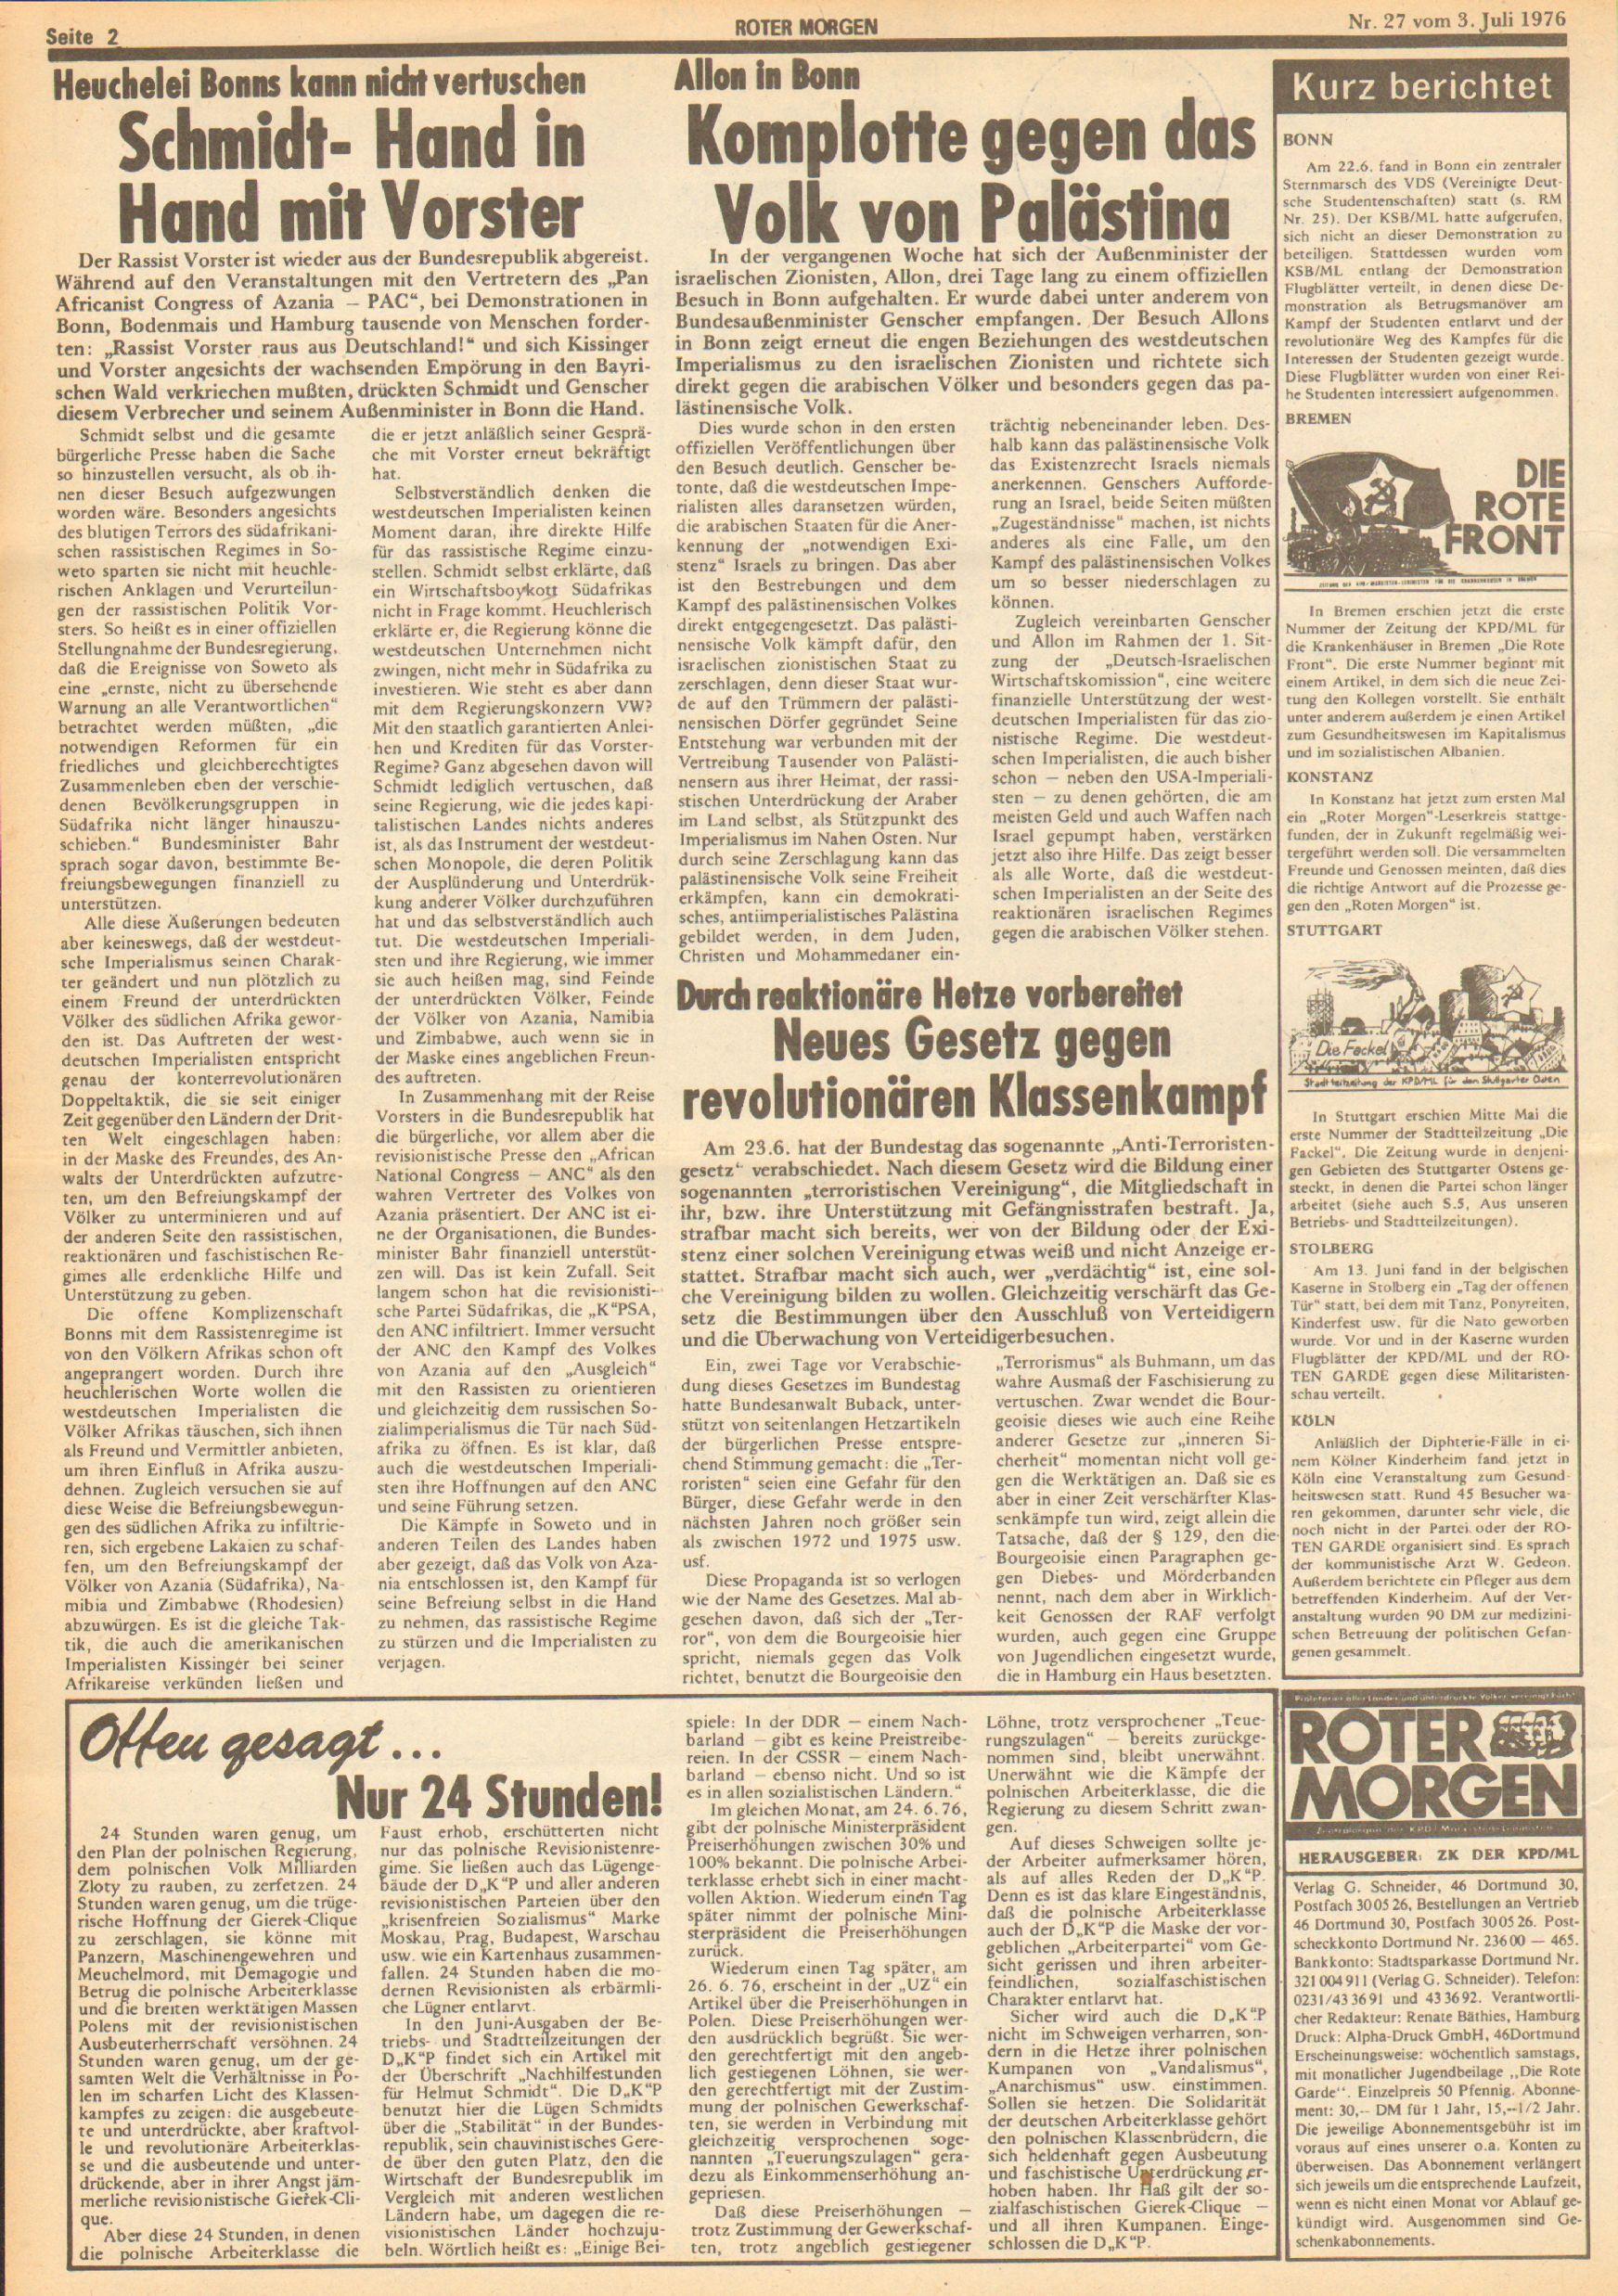 Roter Morgen, 10. Jg., 3. Juli 1976, Nr. 27, Seite 2